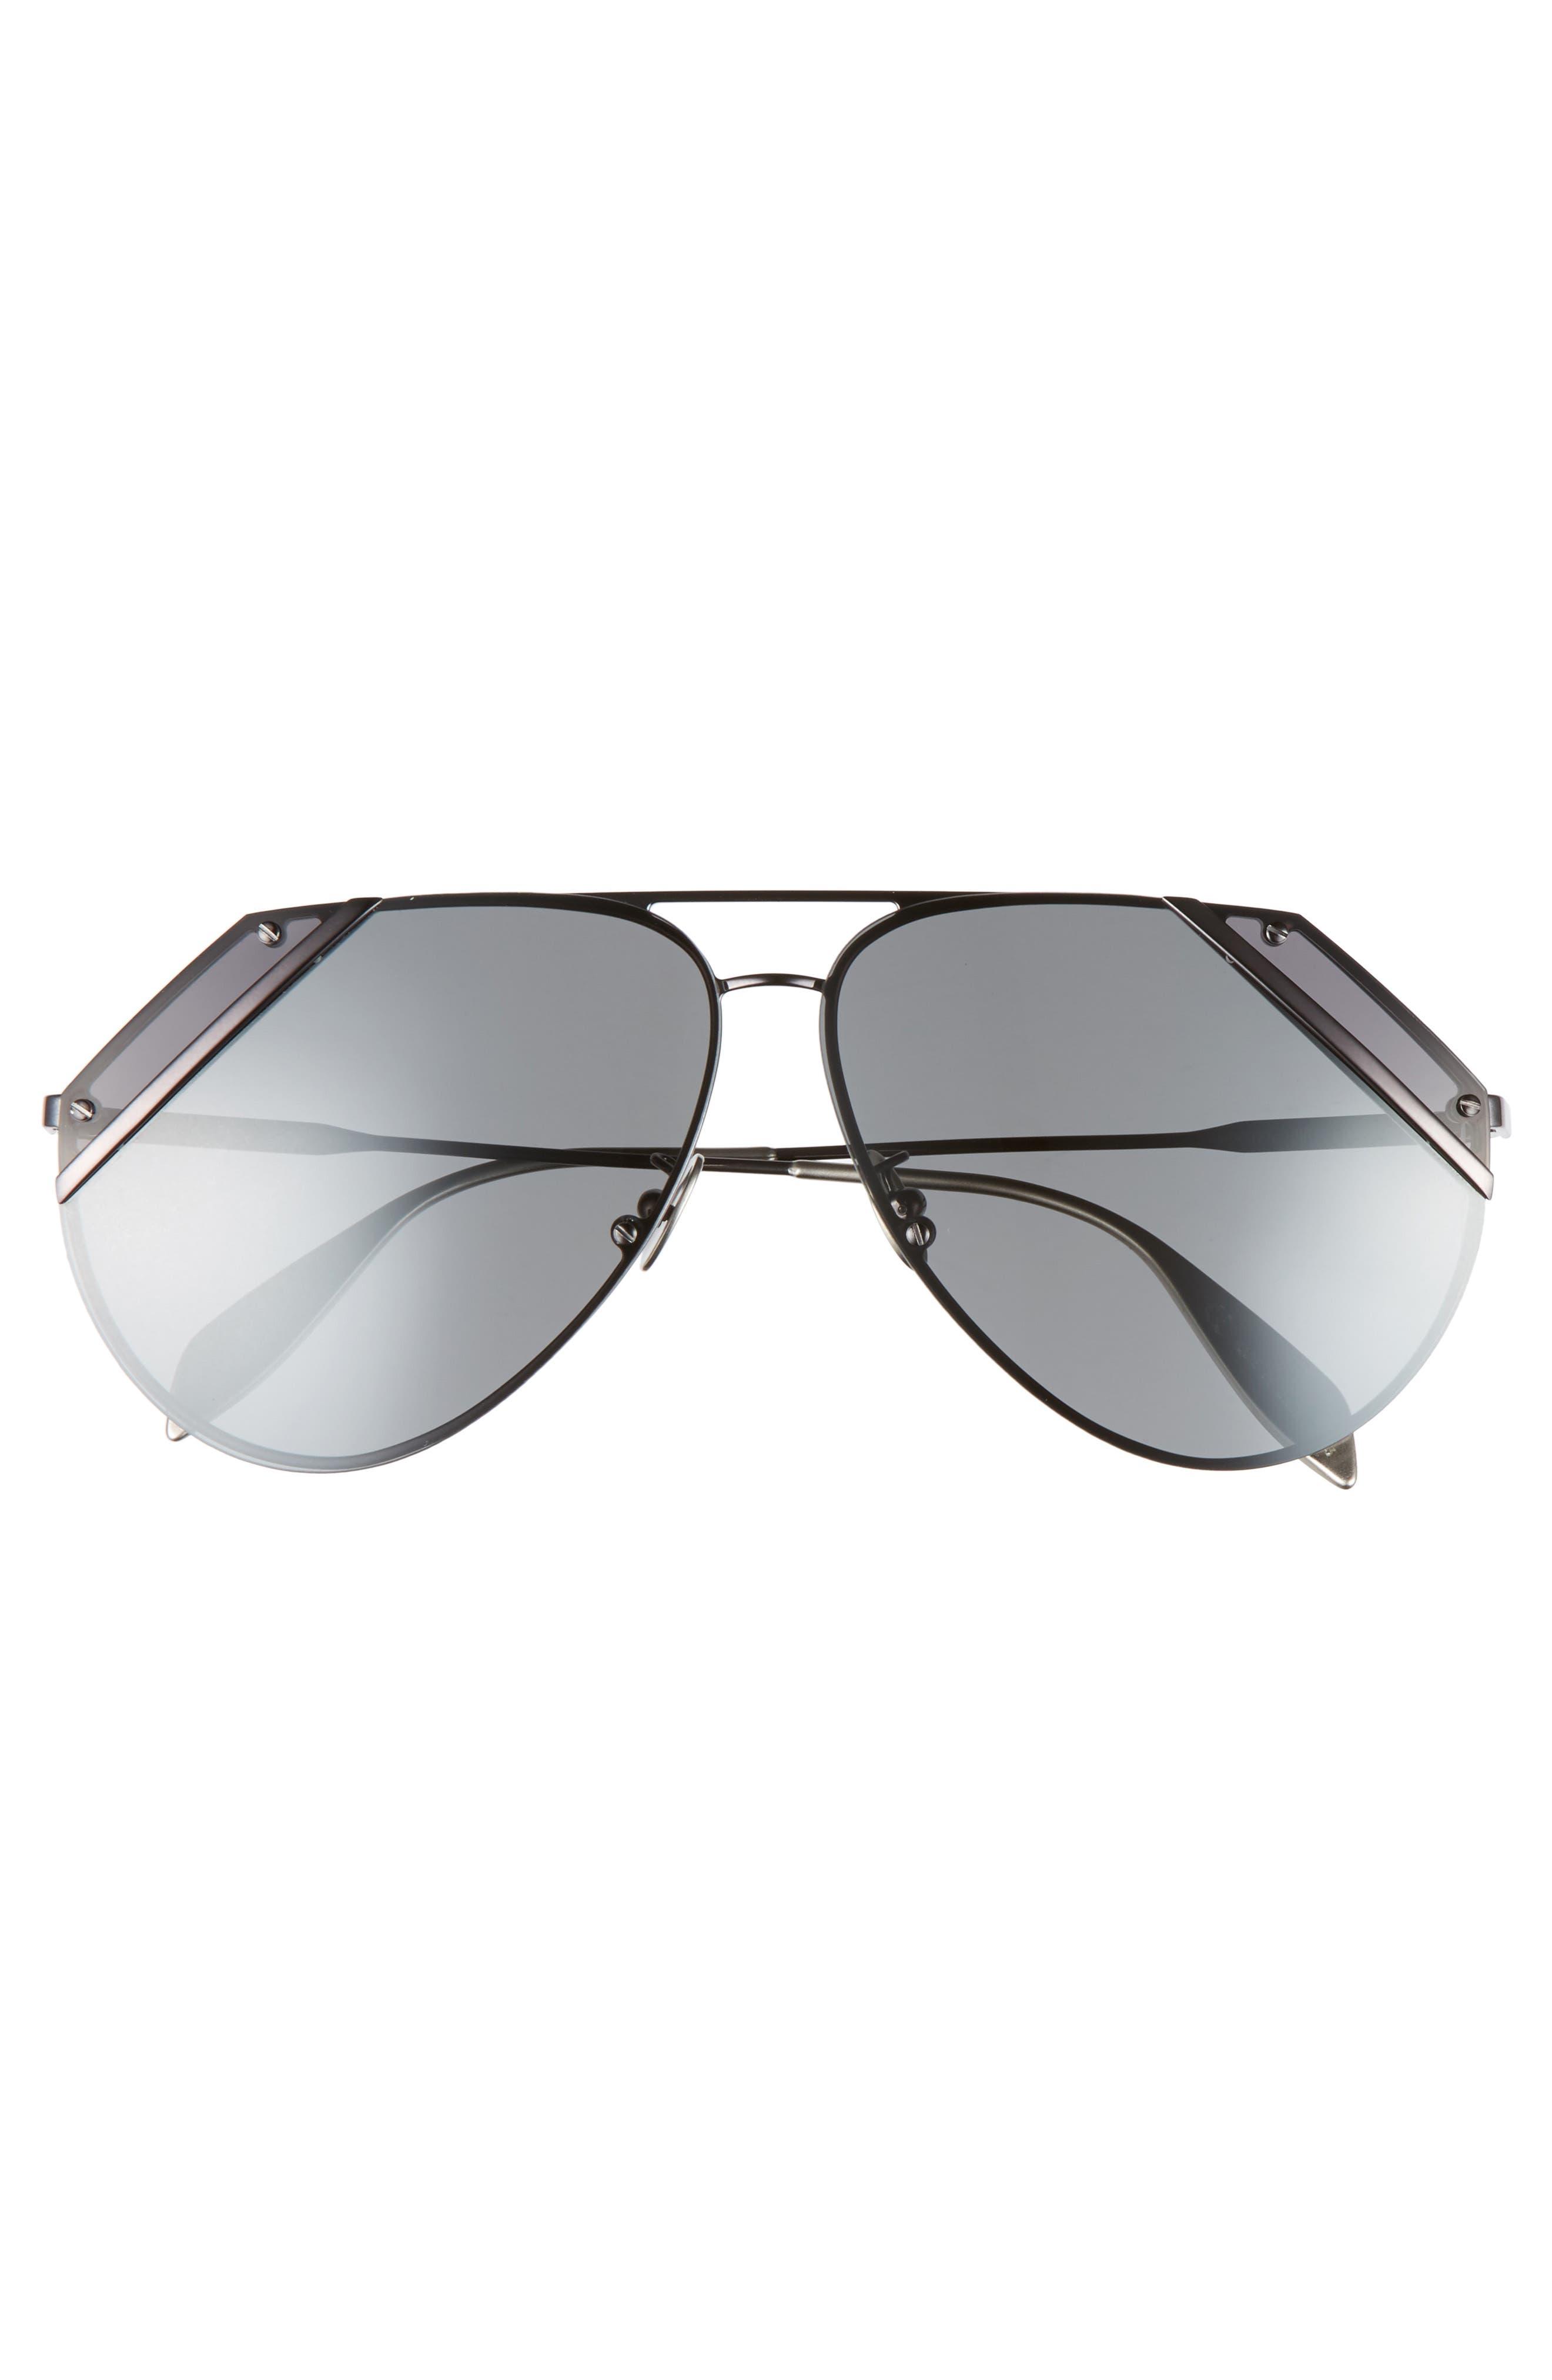 Alternate Image 3  - Alexander McQueen 65mm Snip Frame Aviator Sunglasses